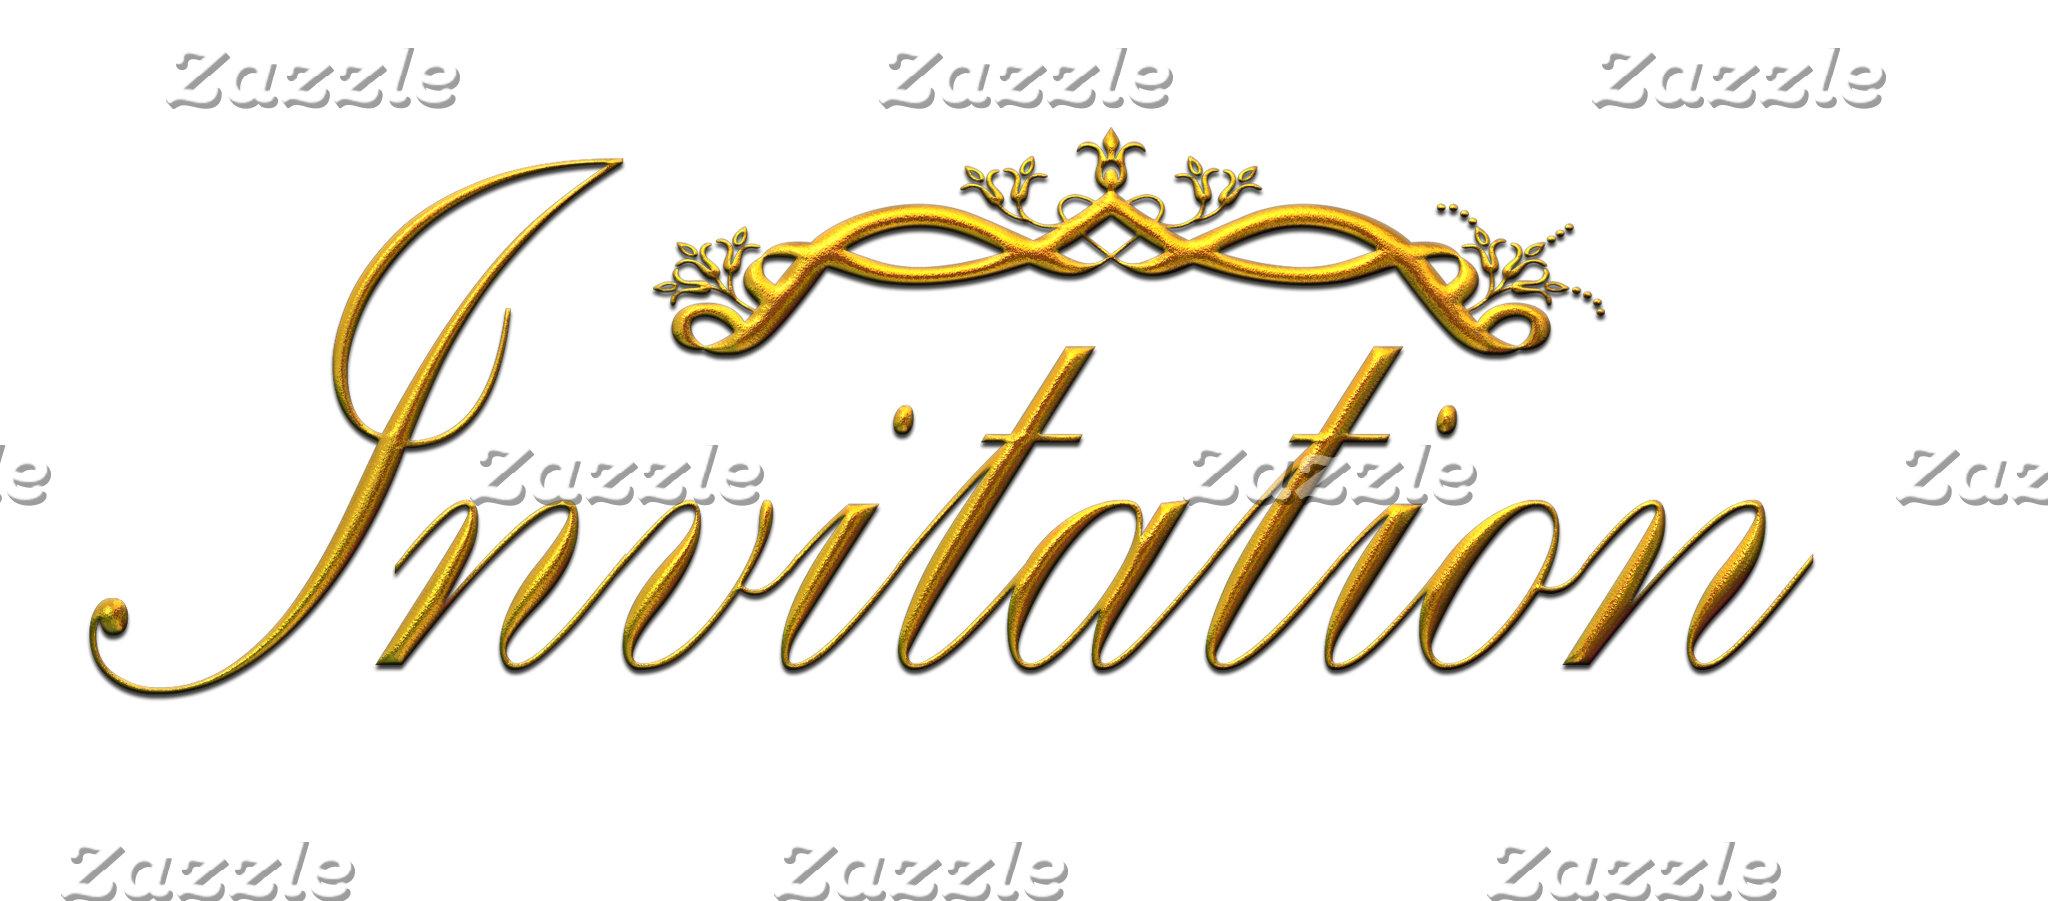 All Occasion